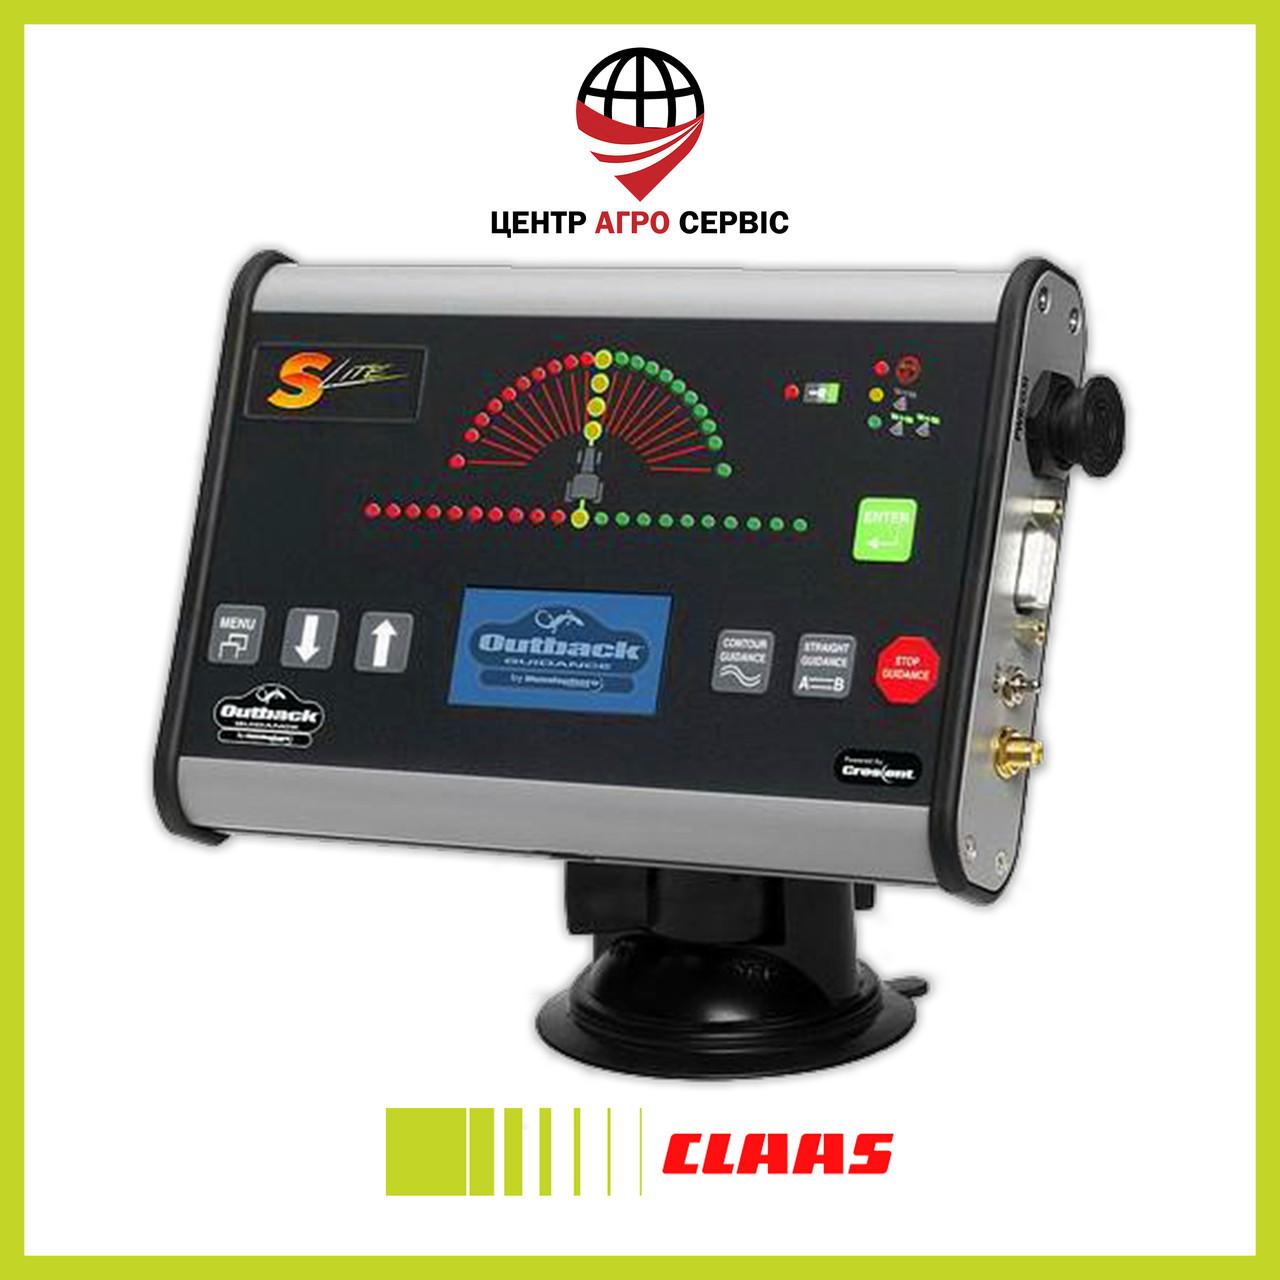 Gps навигатор для трактора (навигатор для поля, сельхоз навигатор)  CLAAS outback S-lite